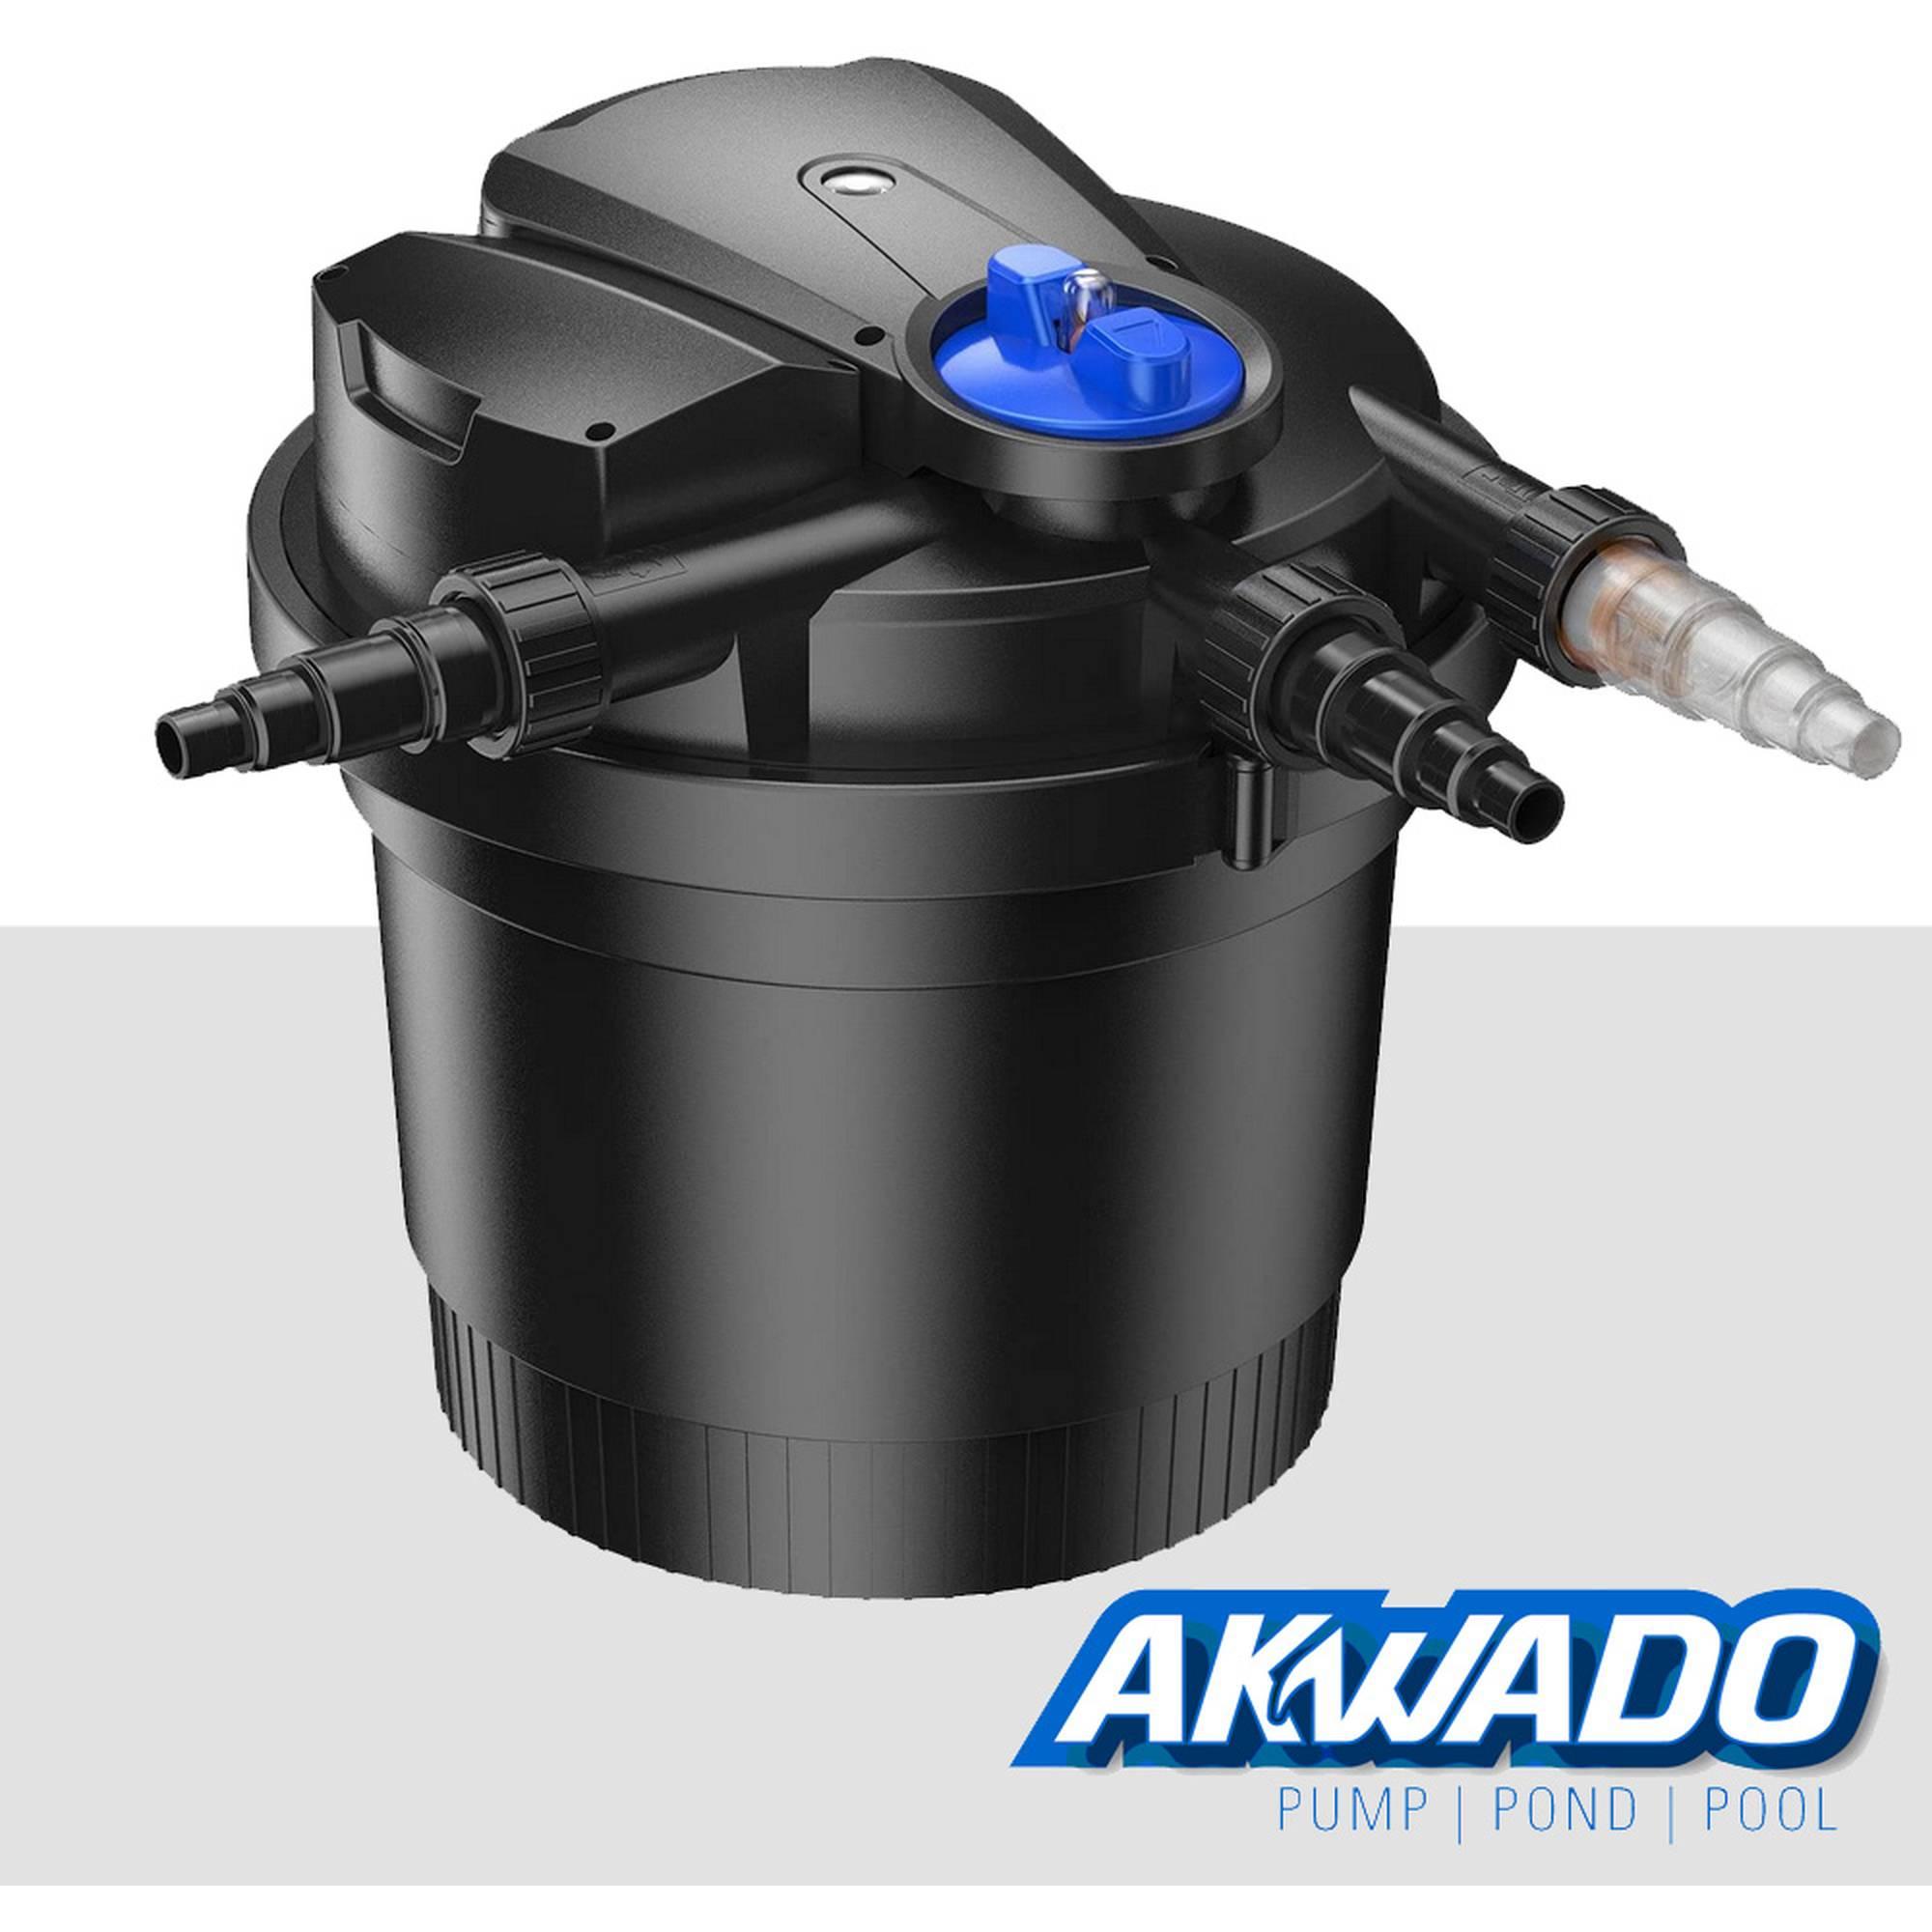 AKWADO Teichdruckfilter Automatic